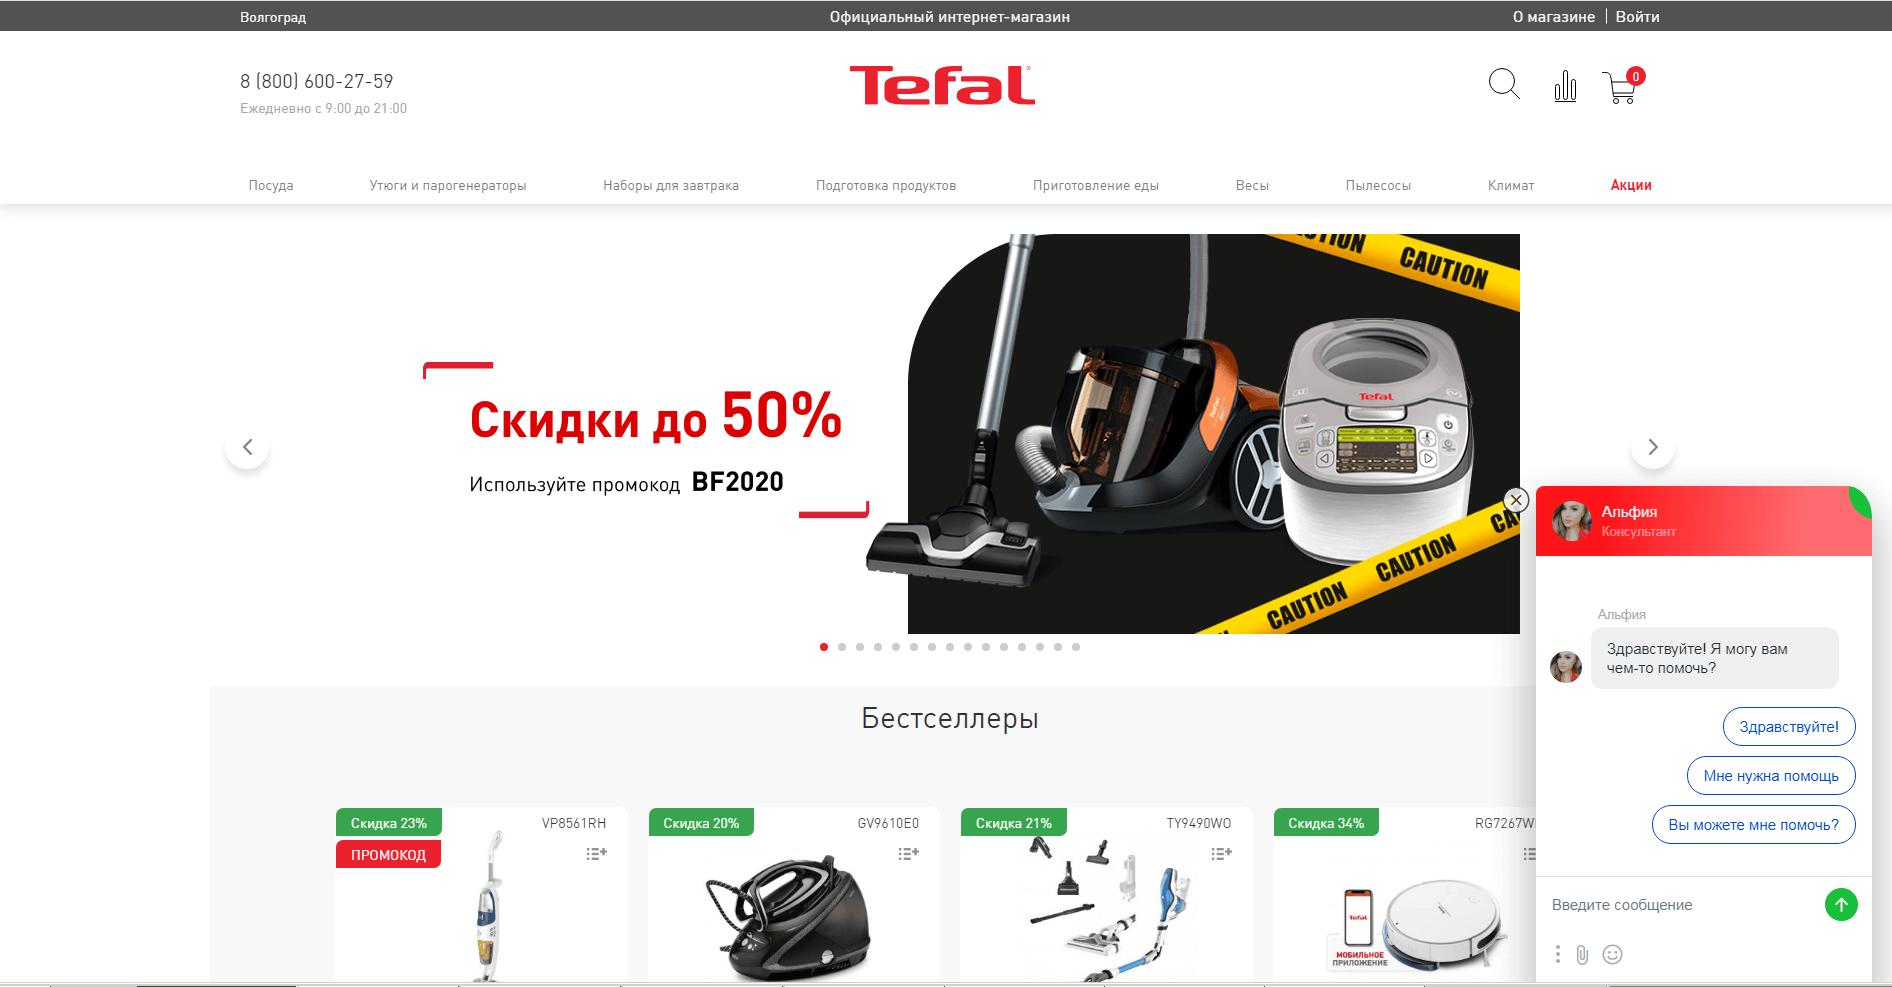 shop.tefal.ru website